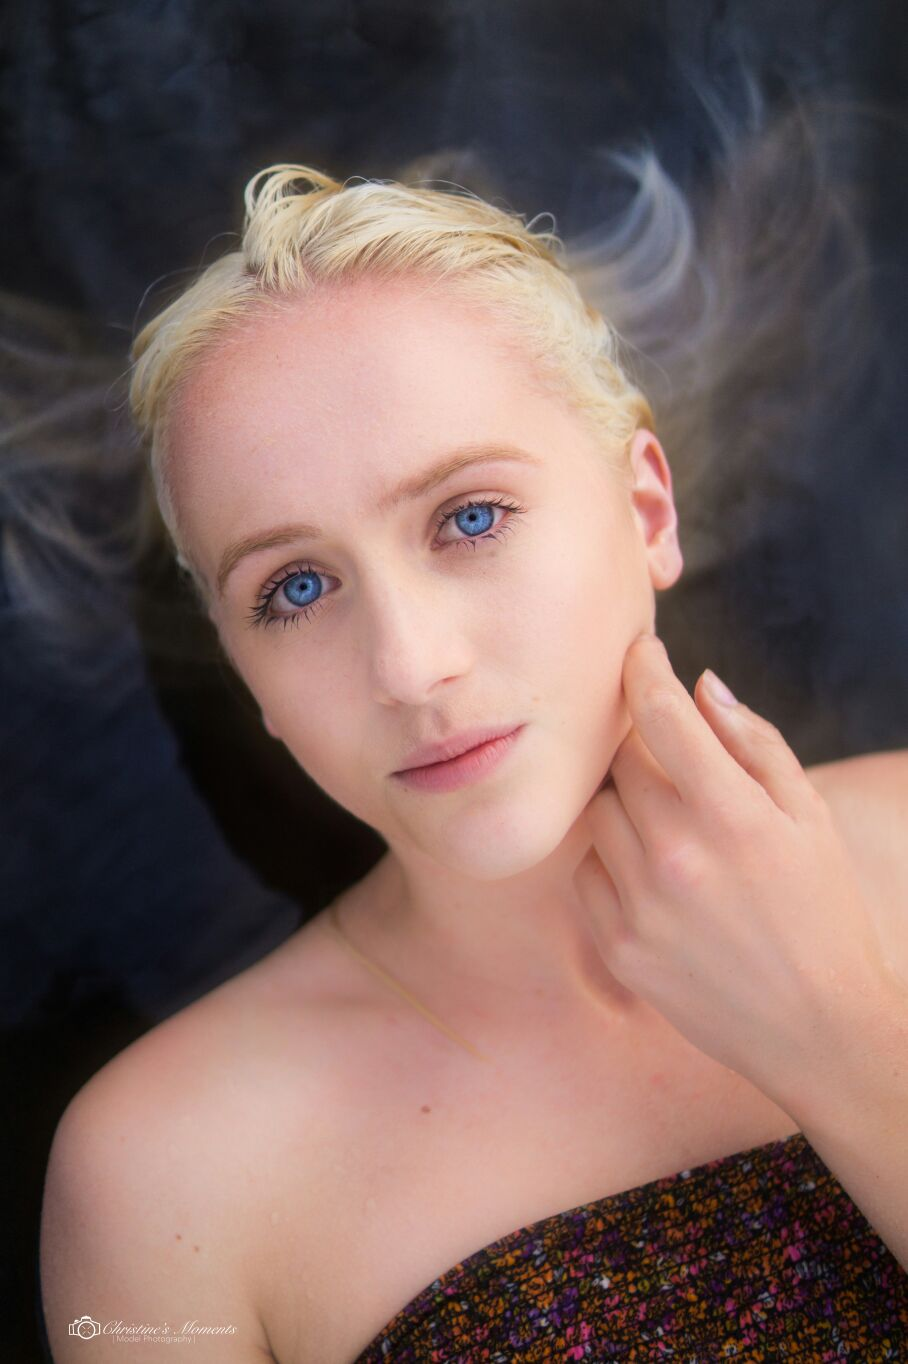 Photo by Christine van der Velden; Model: Nikki Veerman